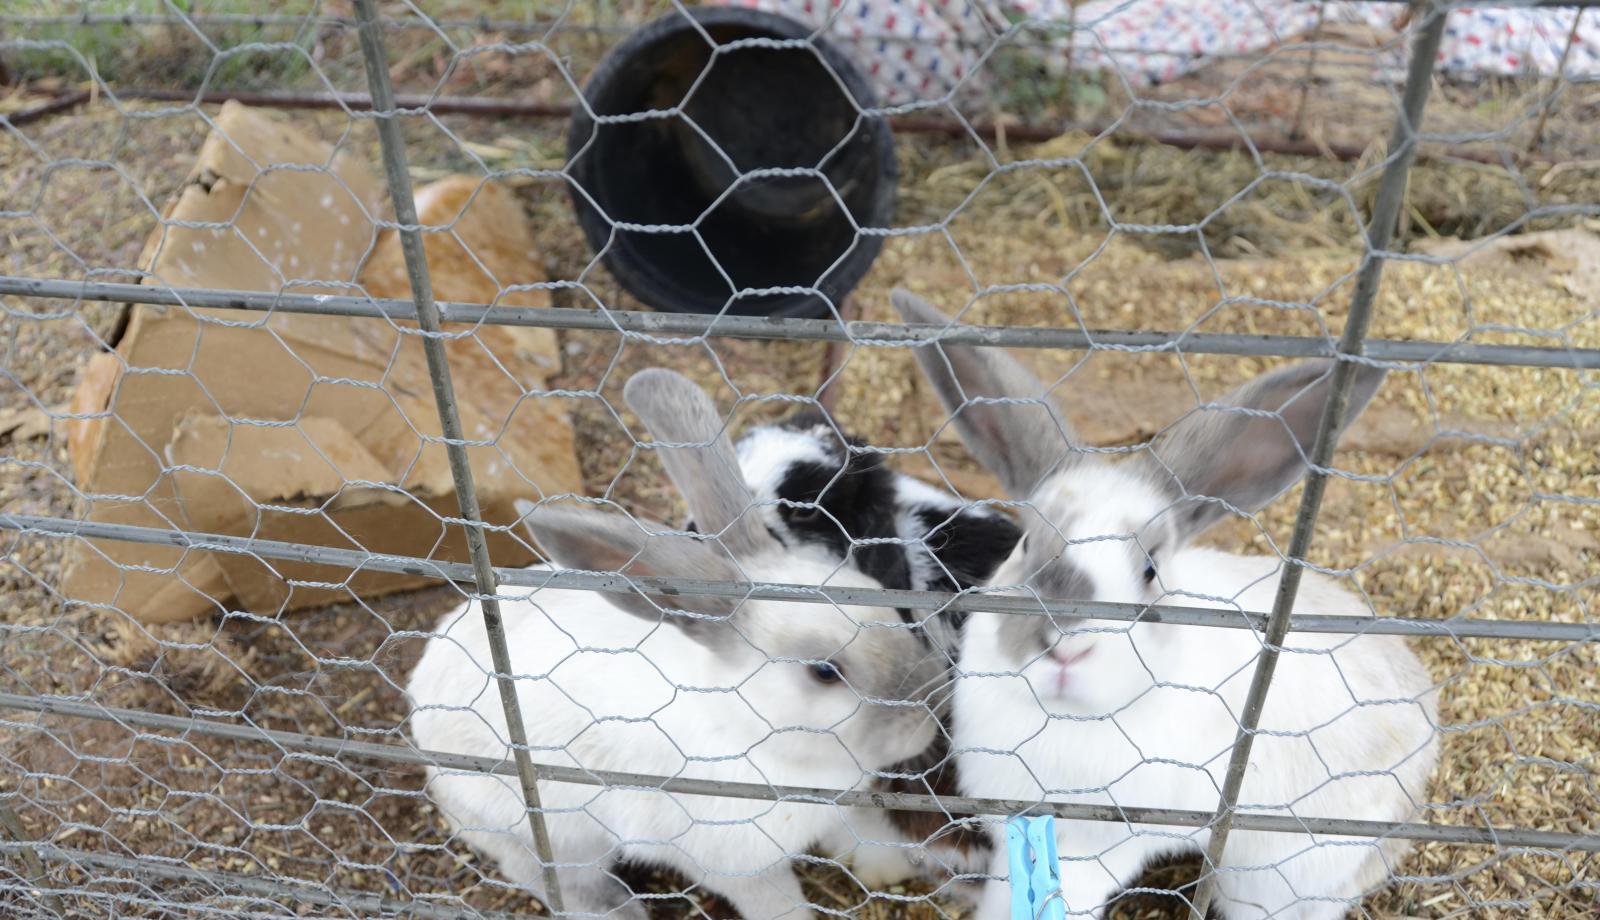 Australian authorities set to release deadly virus to stop pest rabbits